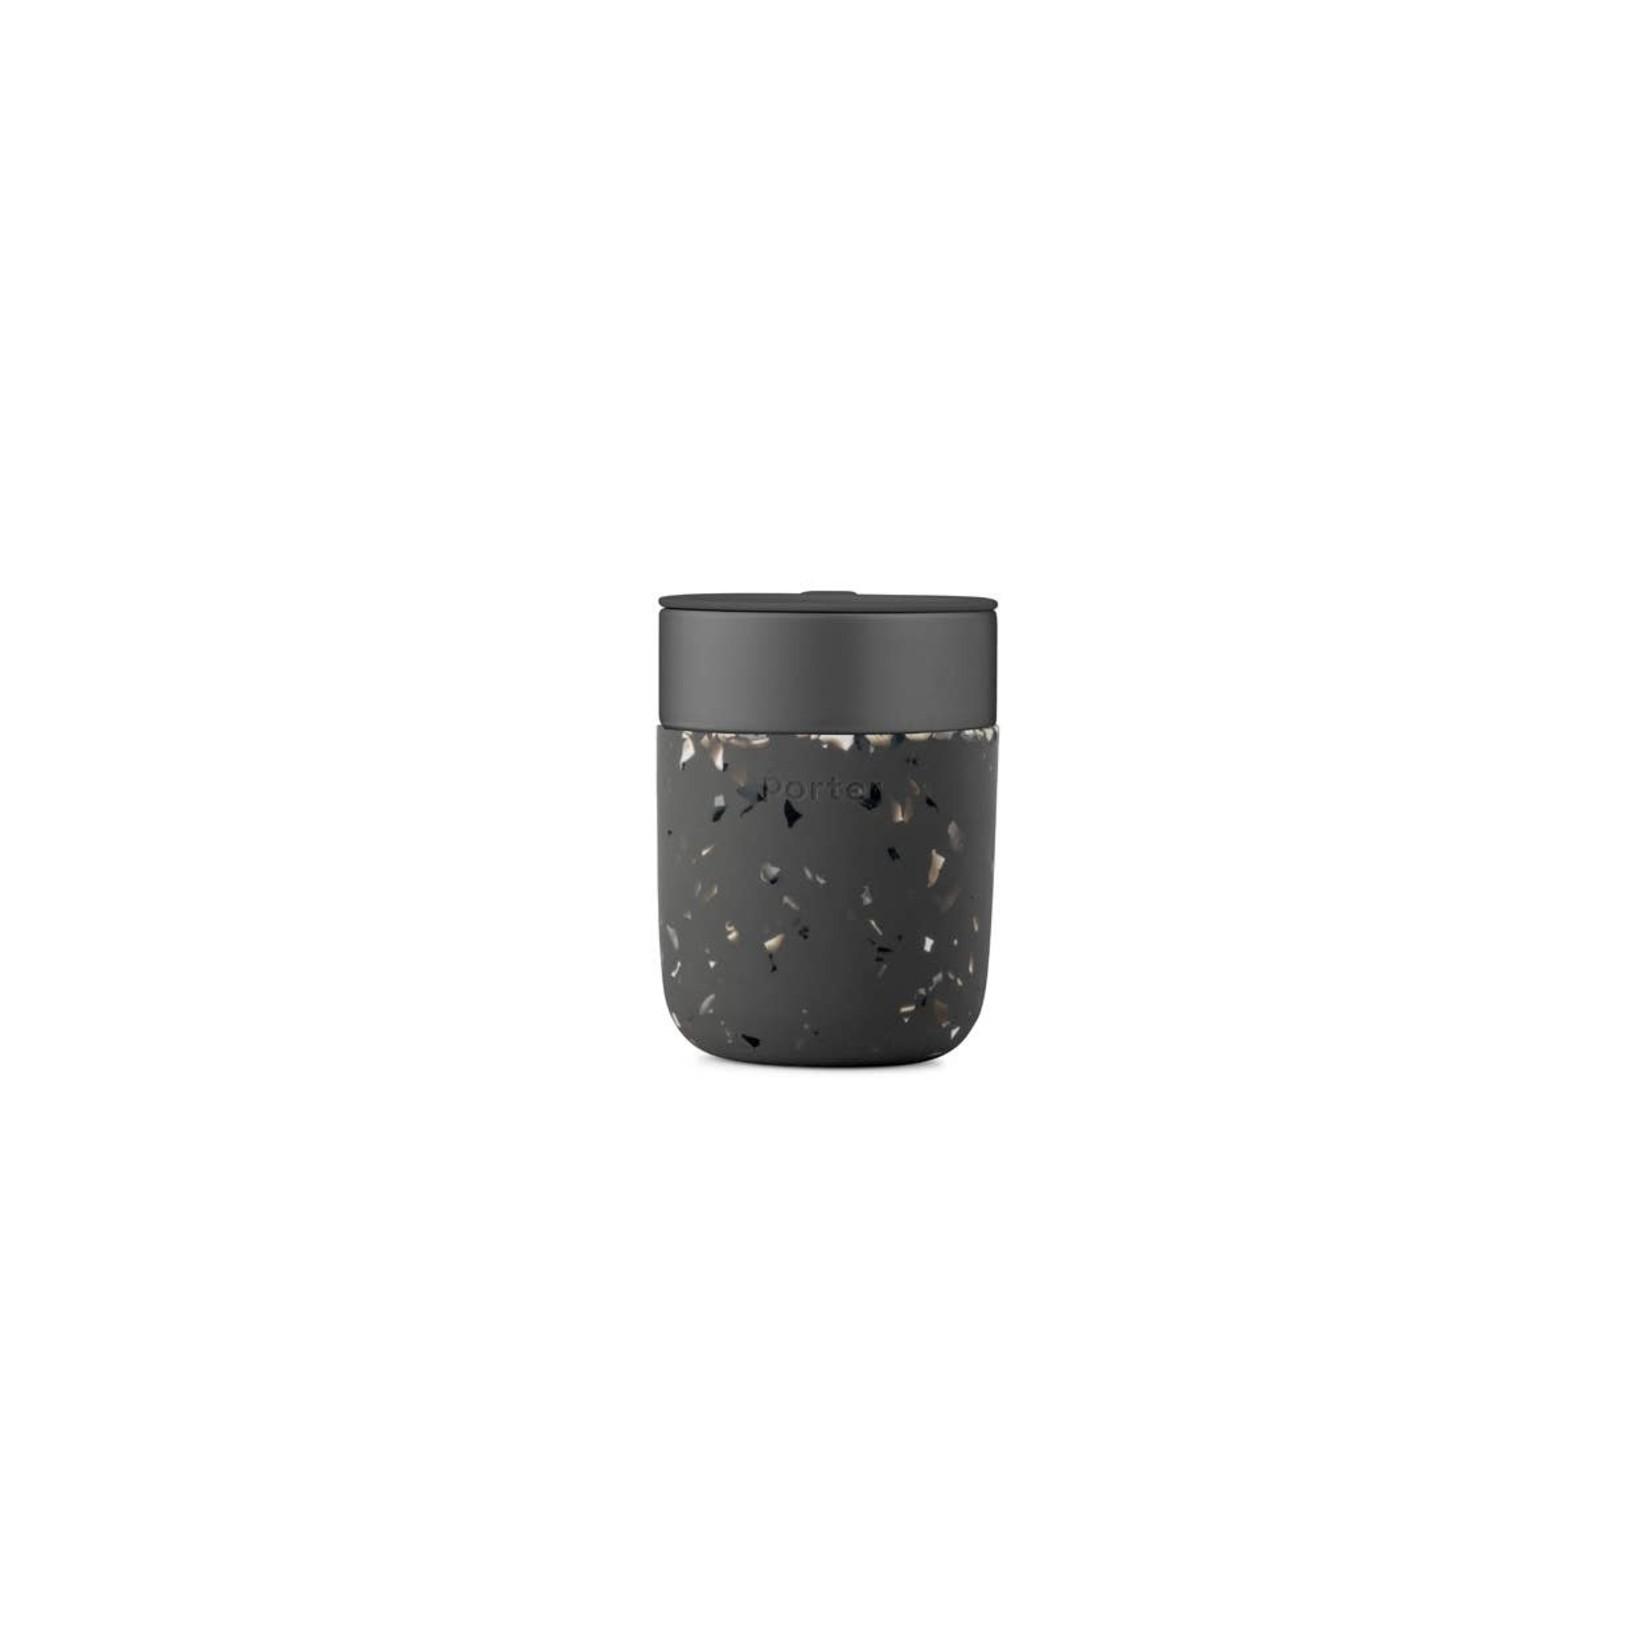 W&P Charcoal Porter Terrazzo Mug